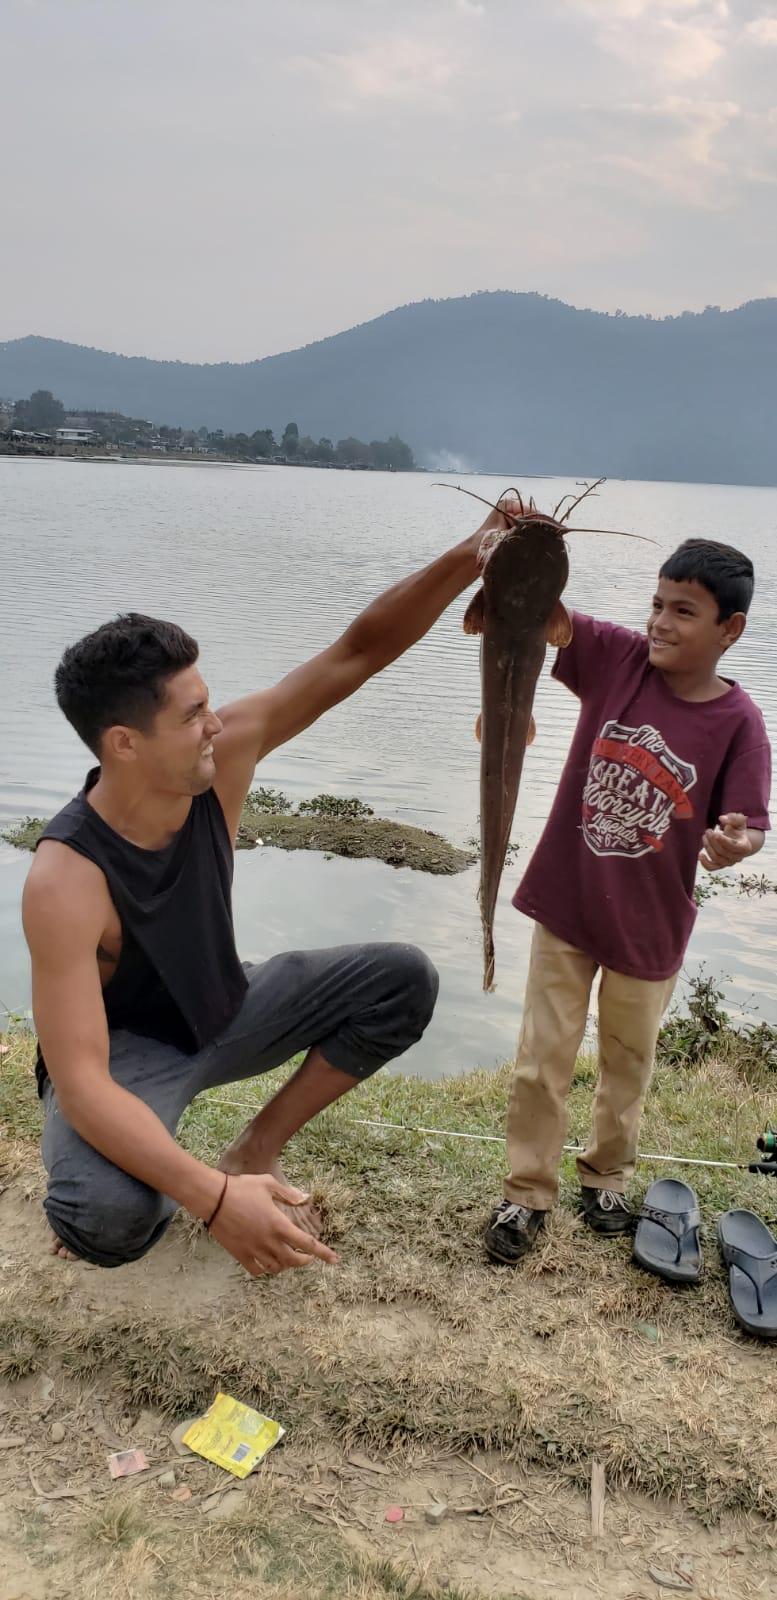 Ryley and Arjun.